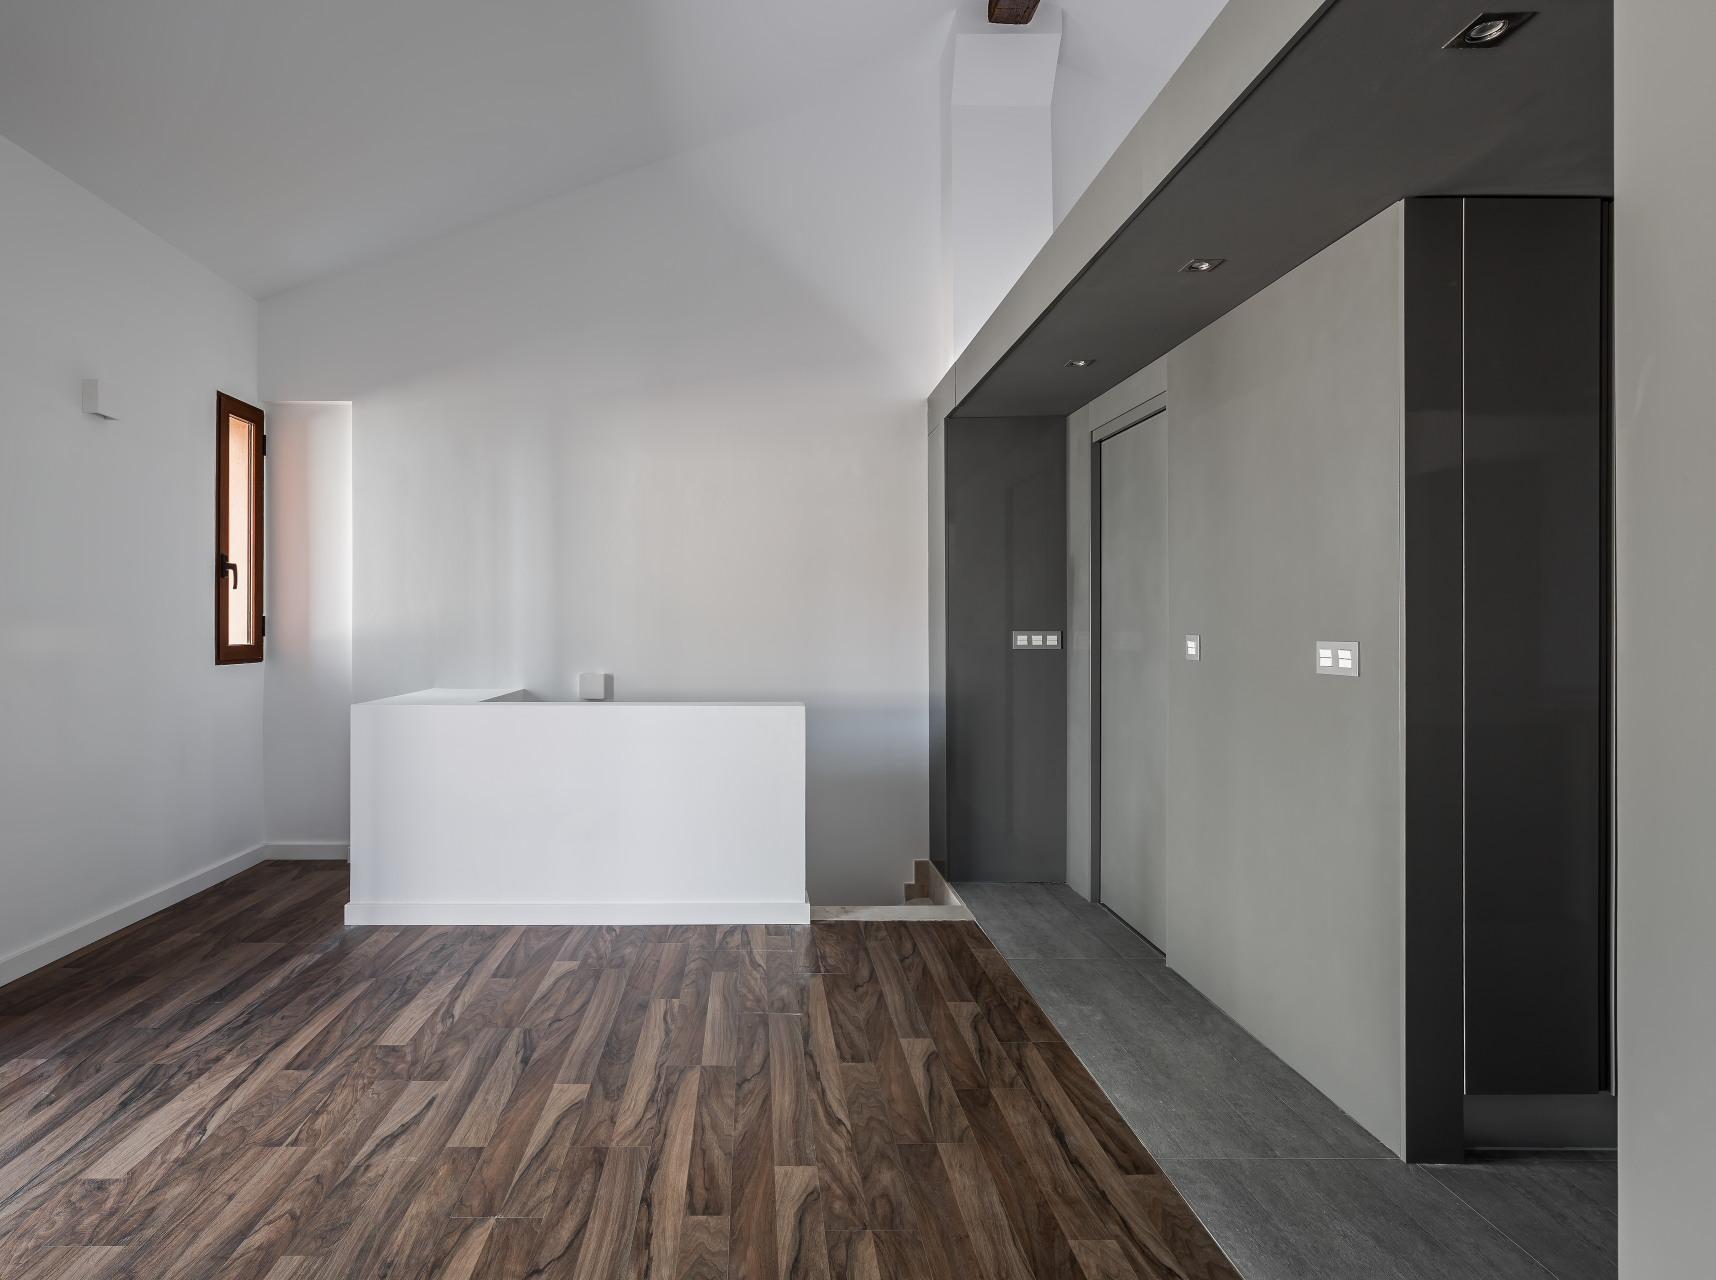 fotografia-arquitectura-valencia-german-cabo-viraje-reforma-campanar (2)